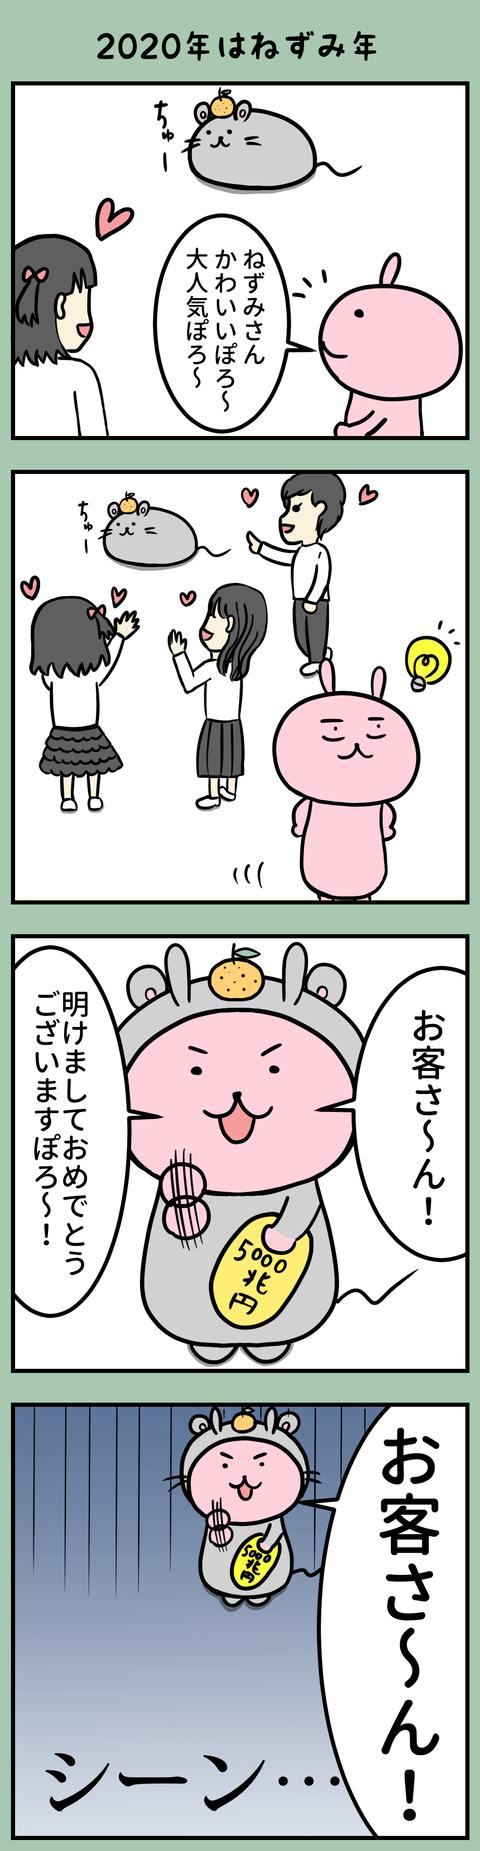 manga-yuzuporo64-1